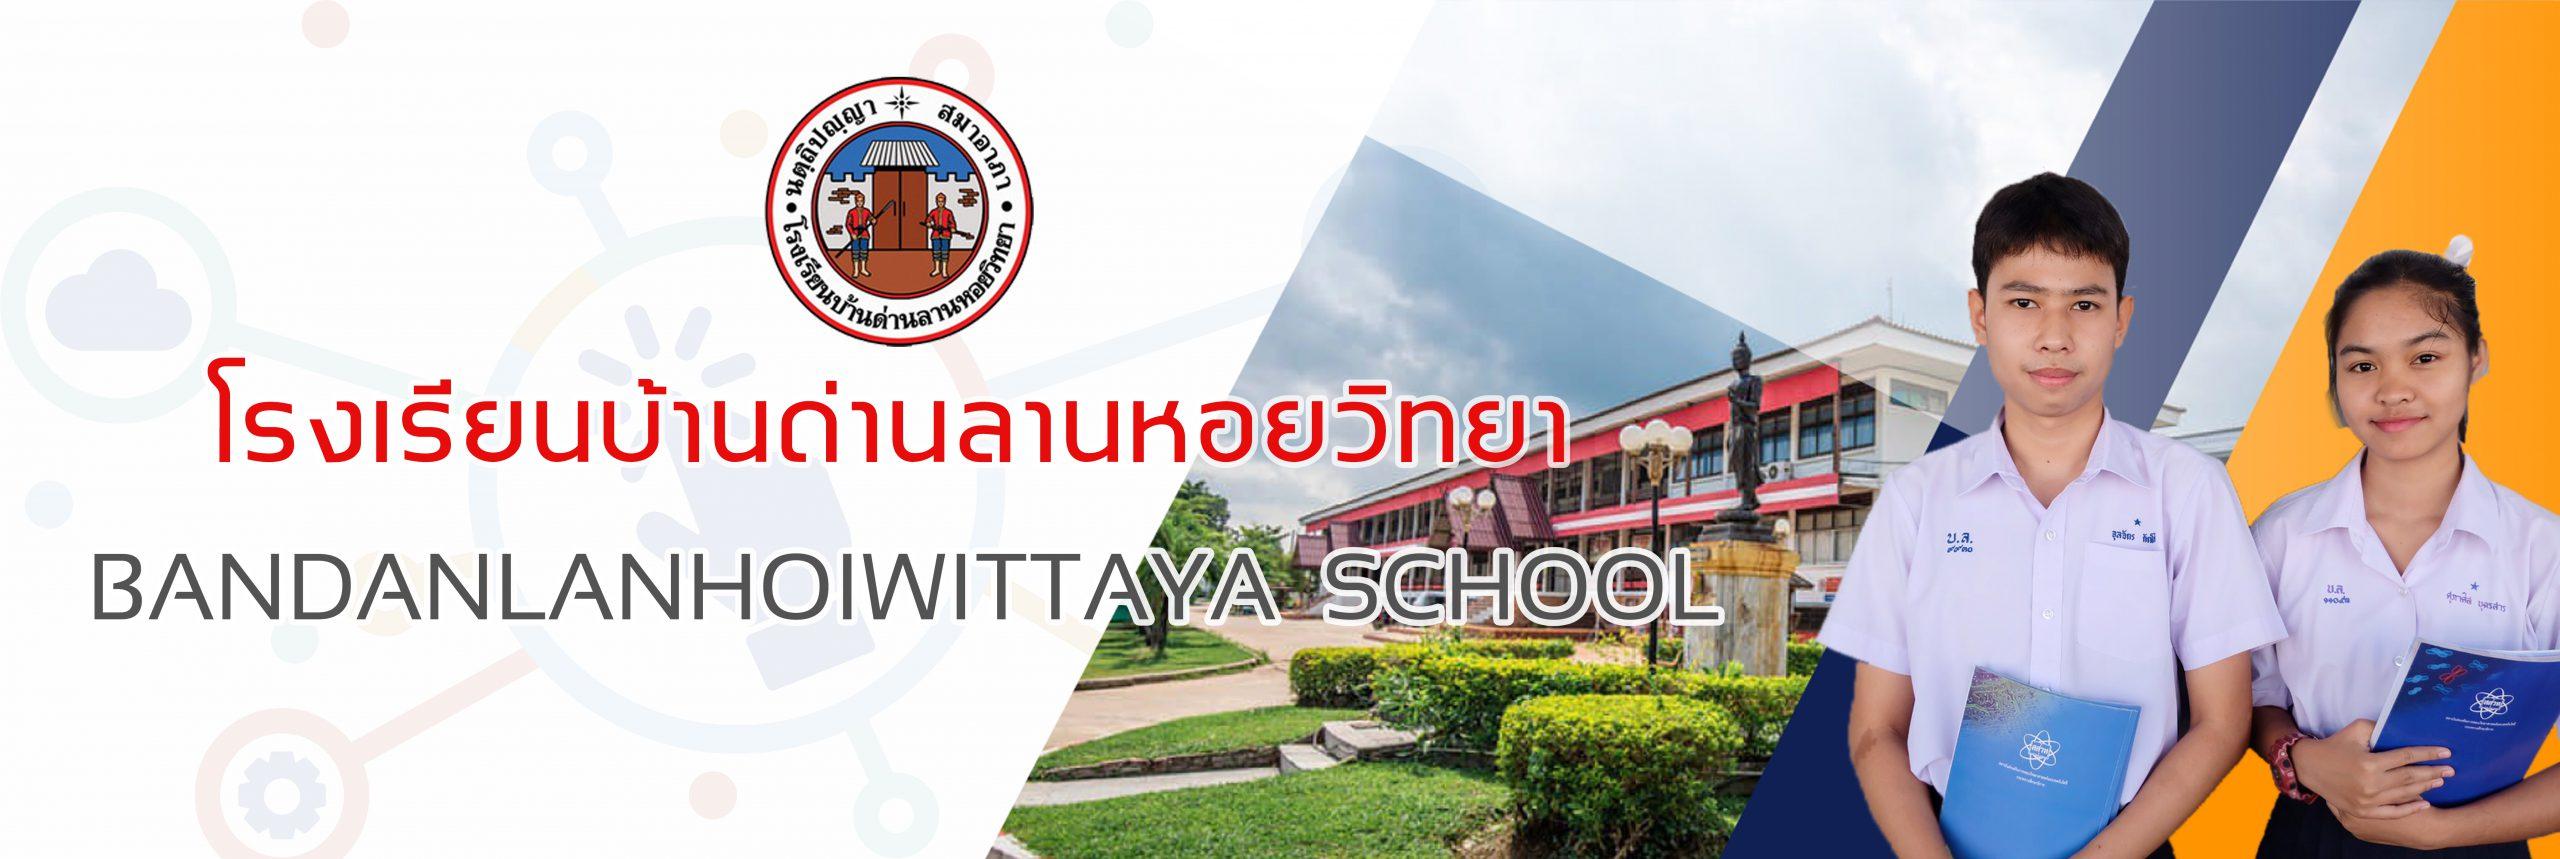 BANDANLANHOIWITTAYA SCHOOL